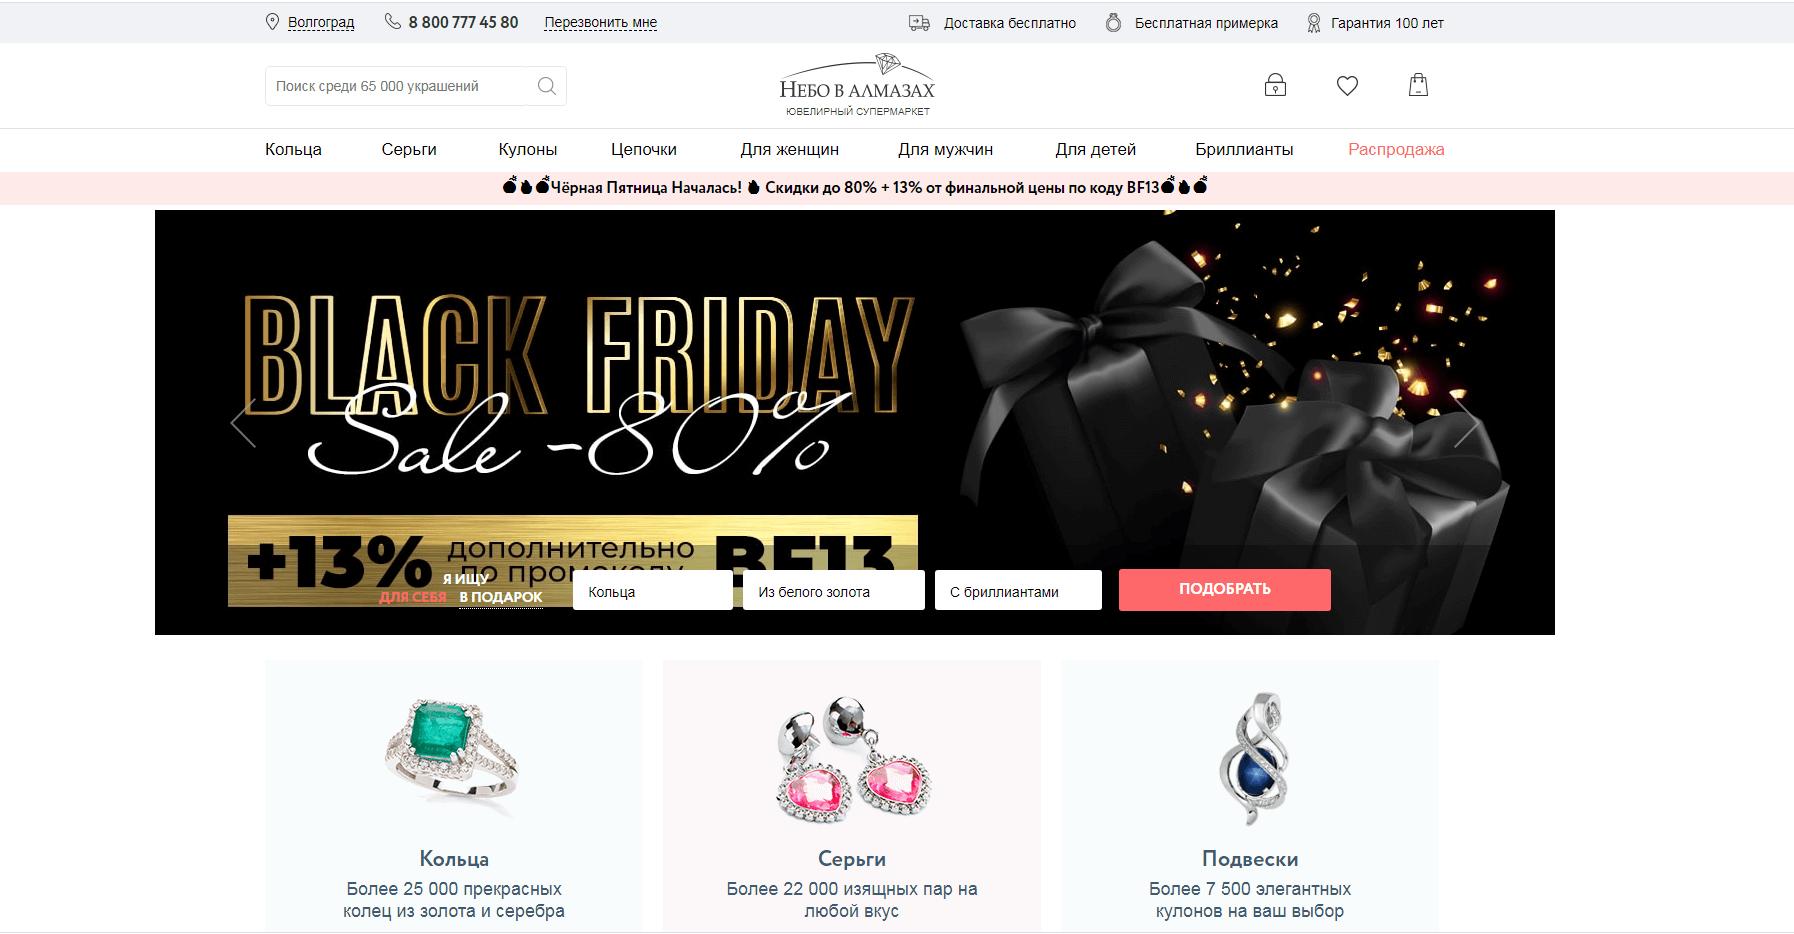 nebo.ru website